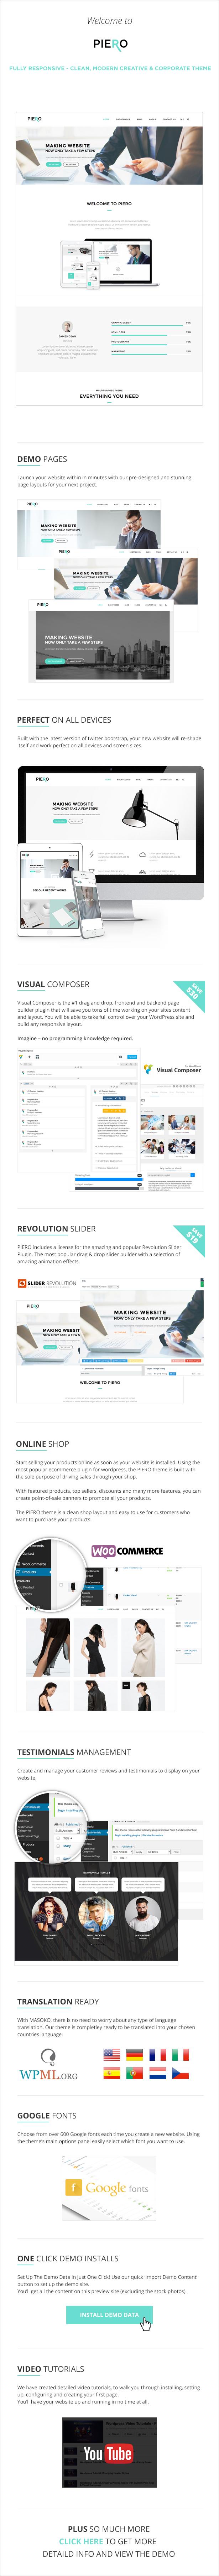 Piero | Clean, Modern, Multi-Purpose WordPress Theme-3